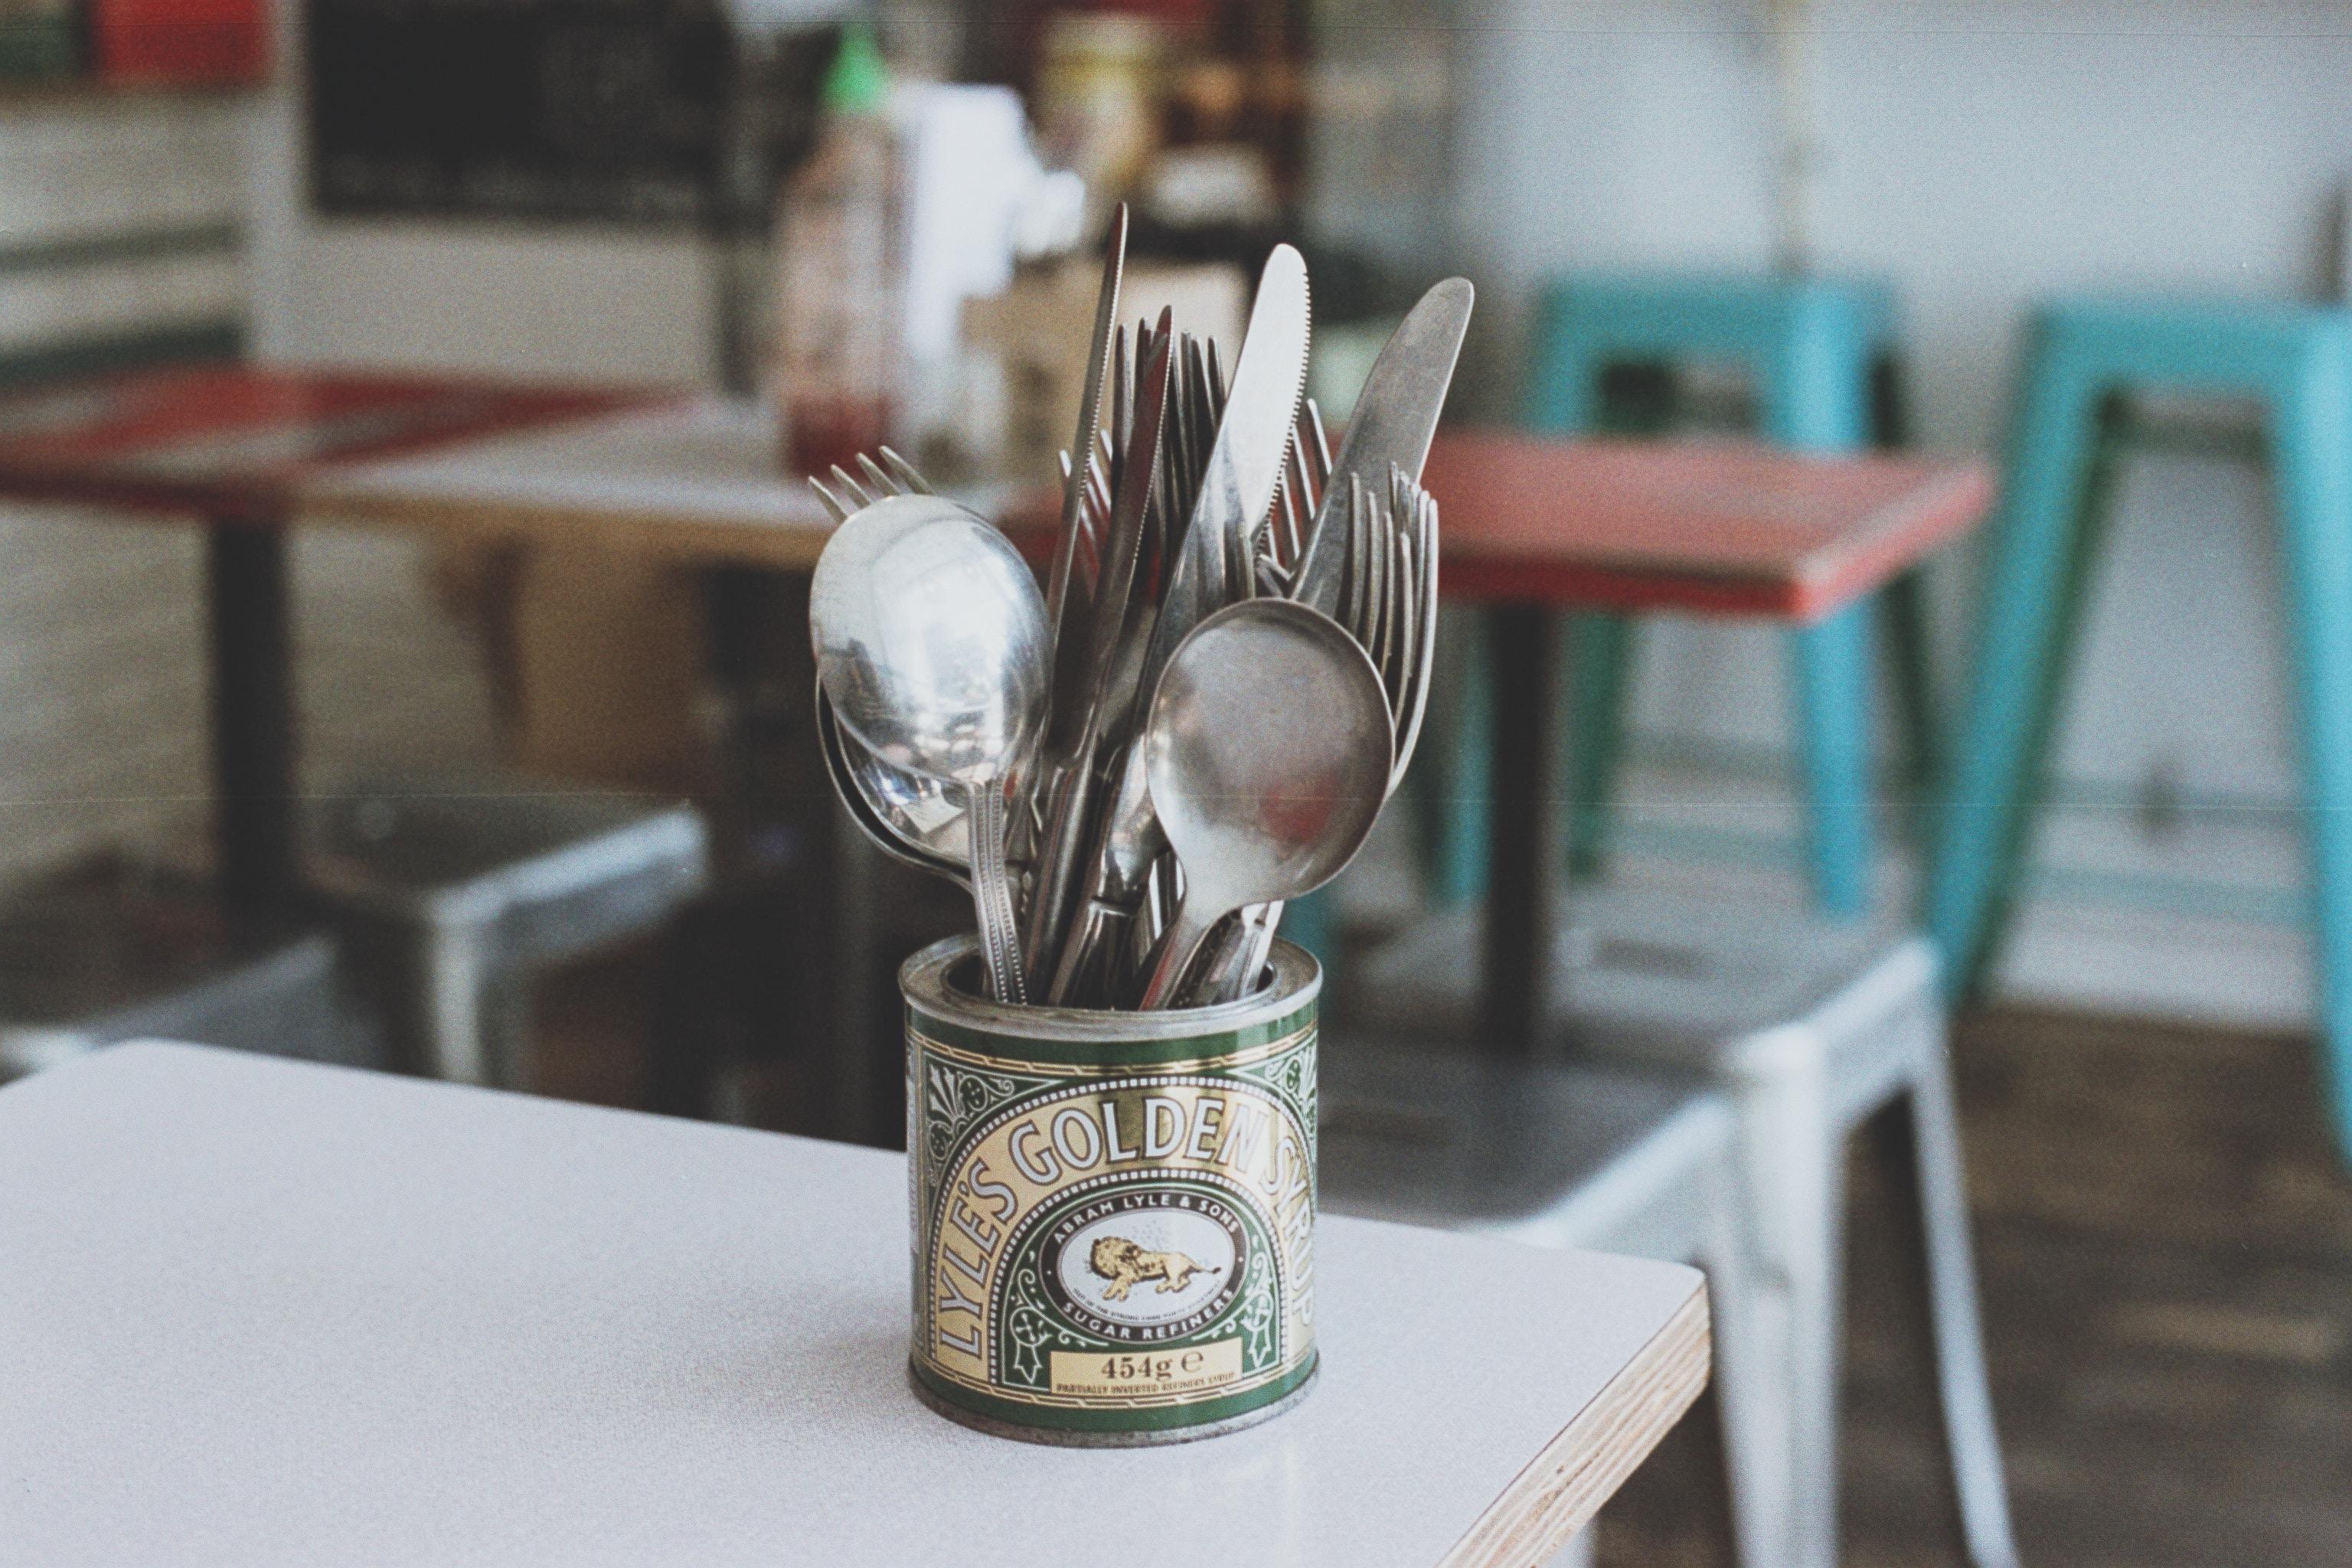 silverware set on table